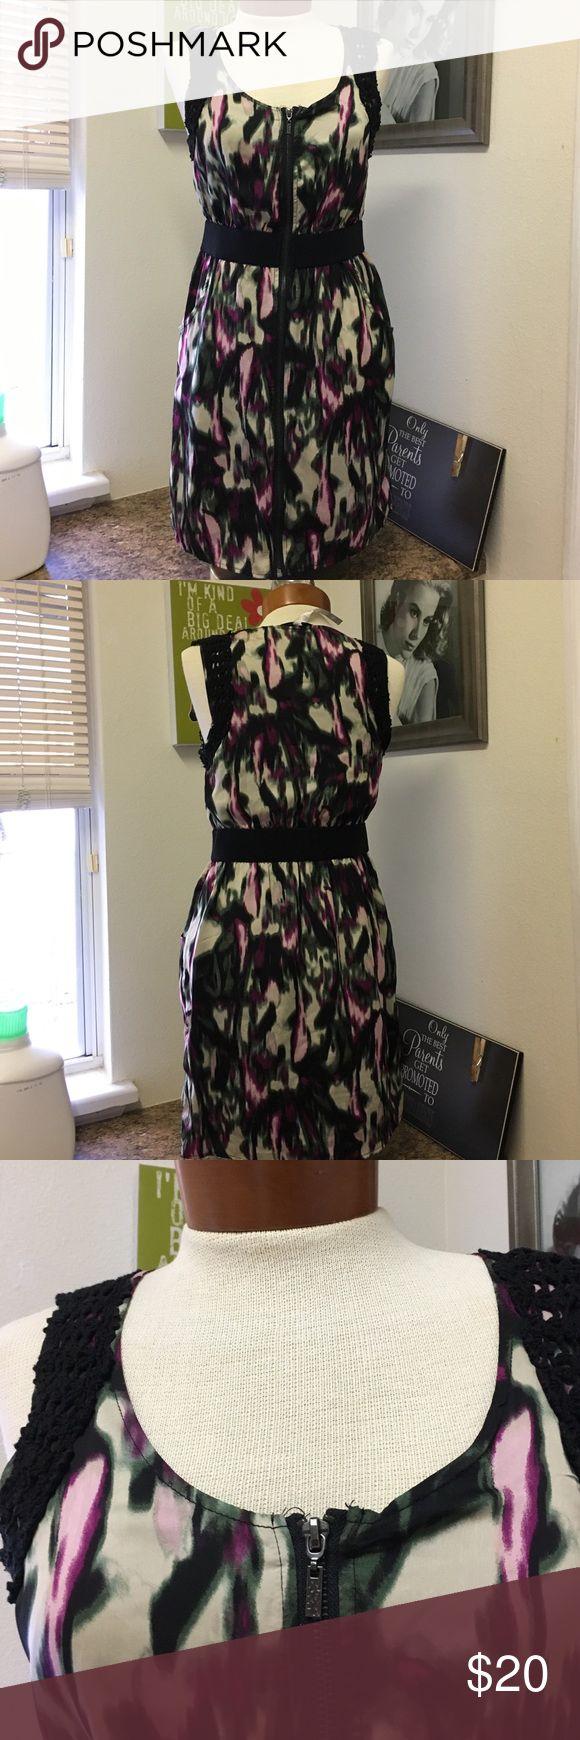 Kensie dress small Black with multi colors dress. Zip up front. Above knee length. Kensie Dresses Mini